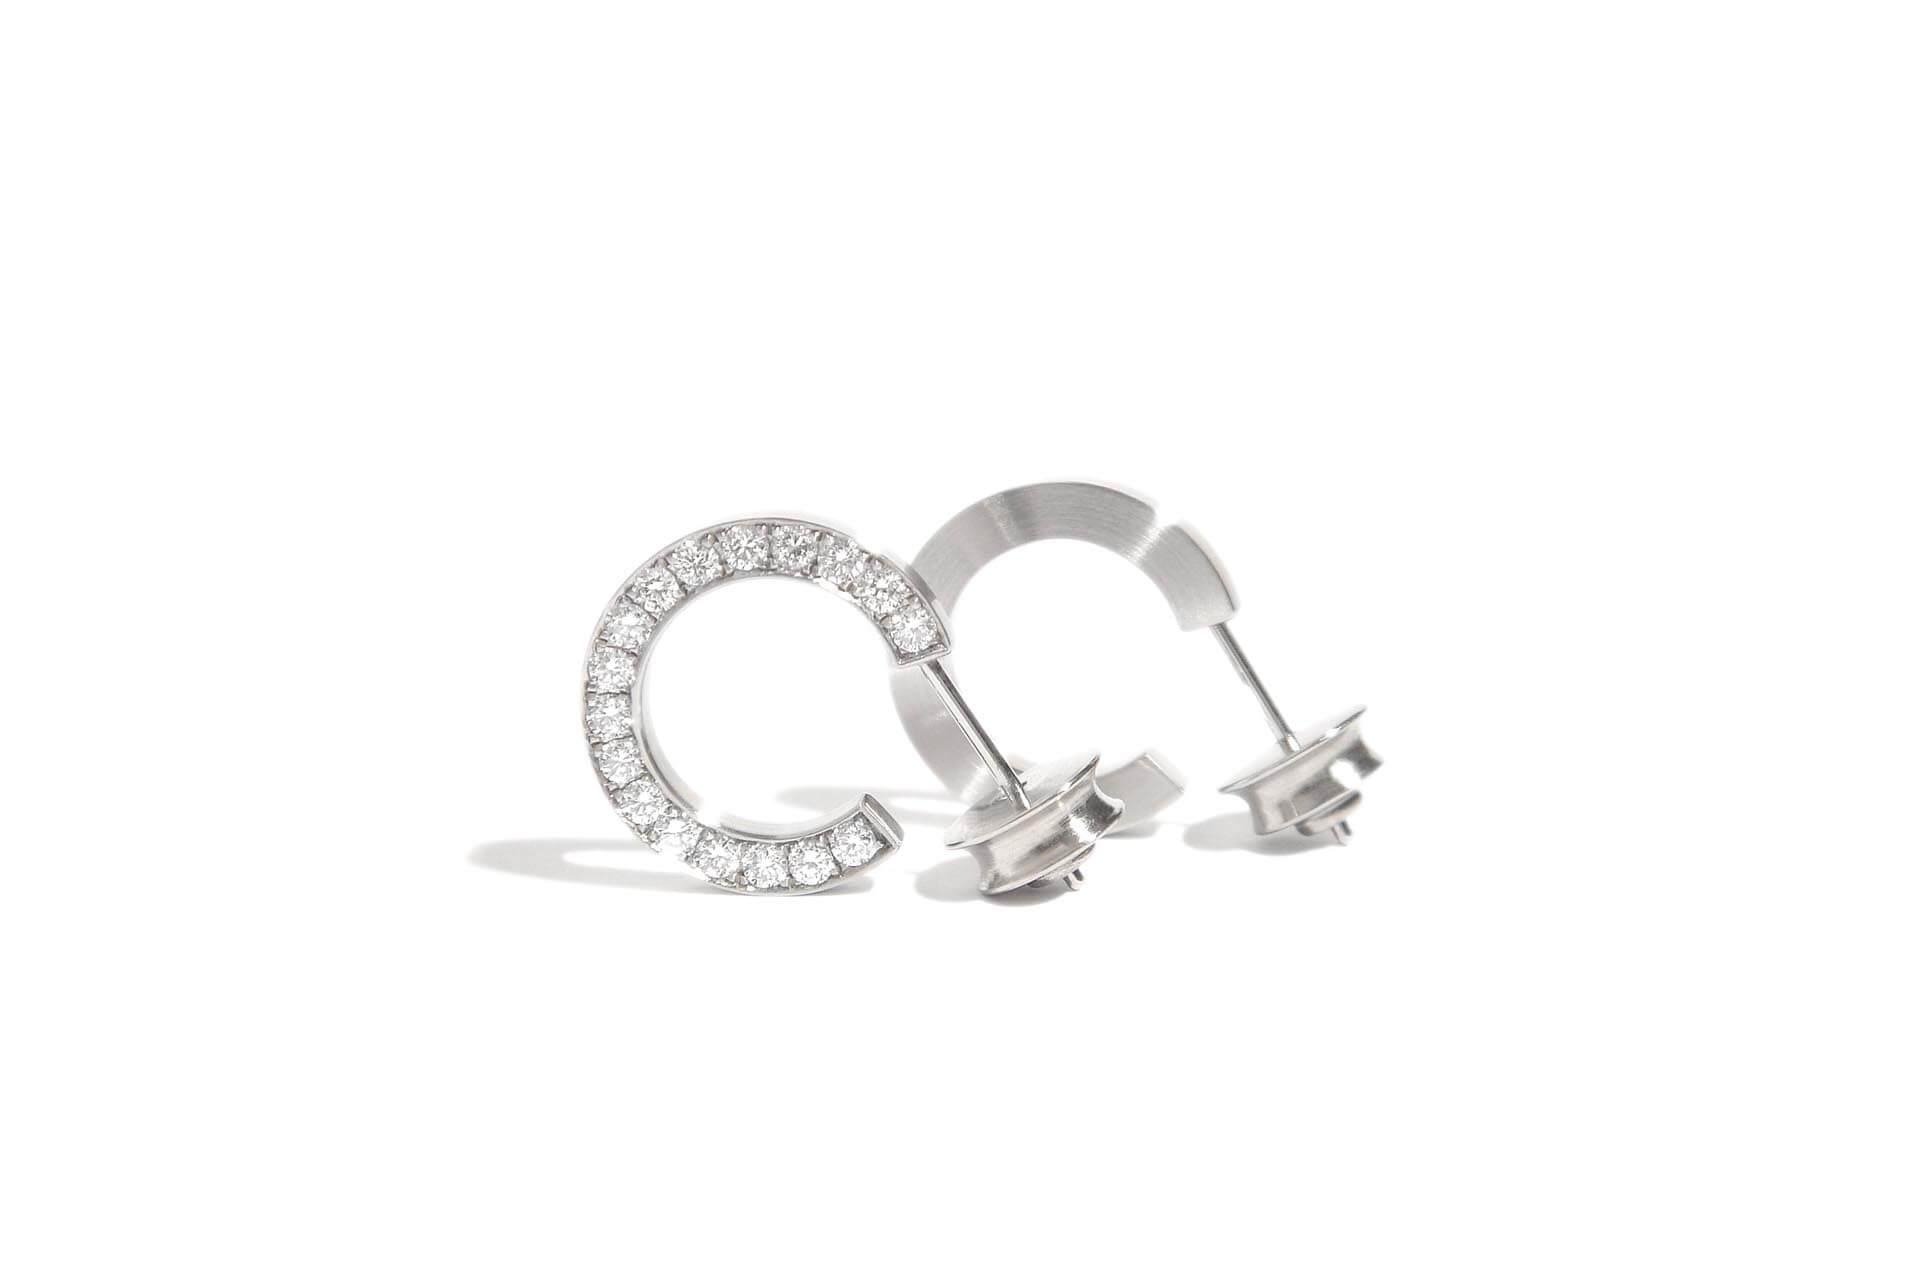 Stainless steel hoop earrings with 34 diamonds set on the side. J.9.004